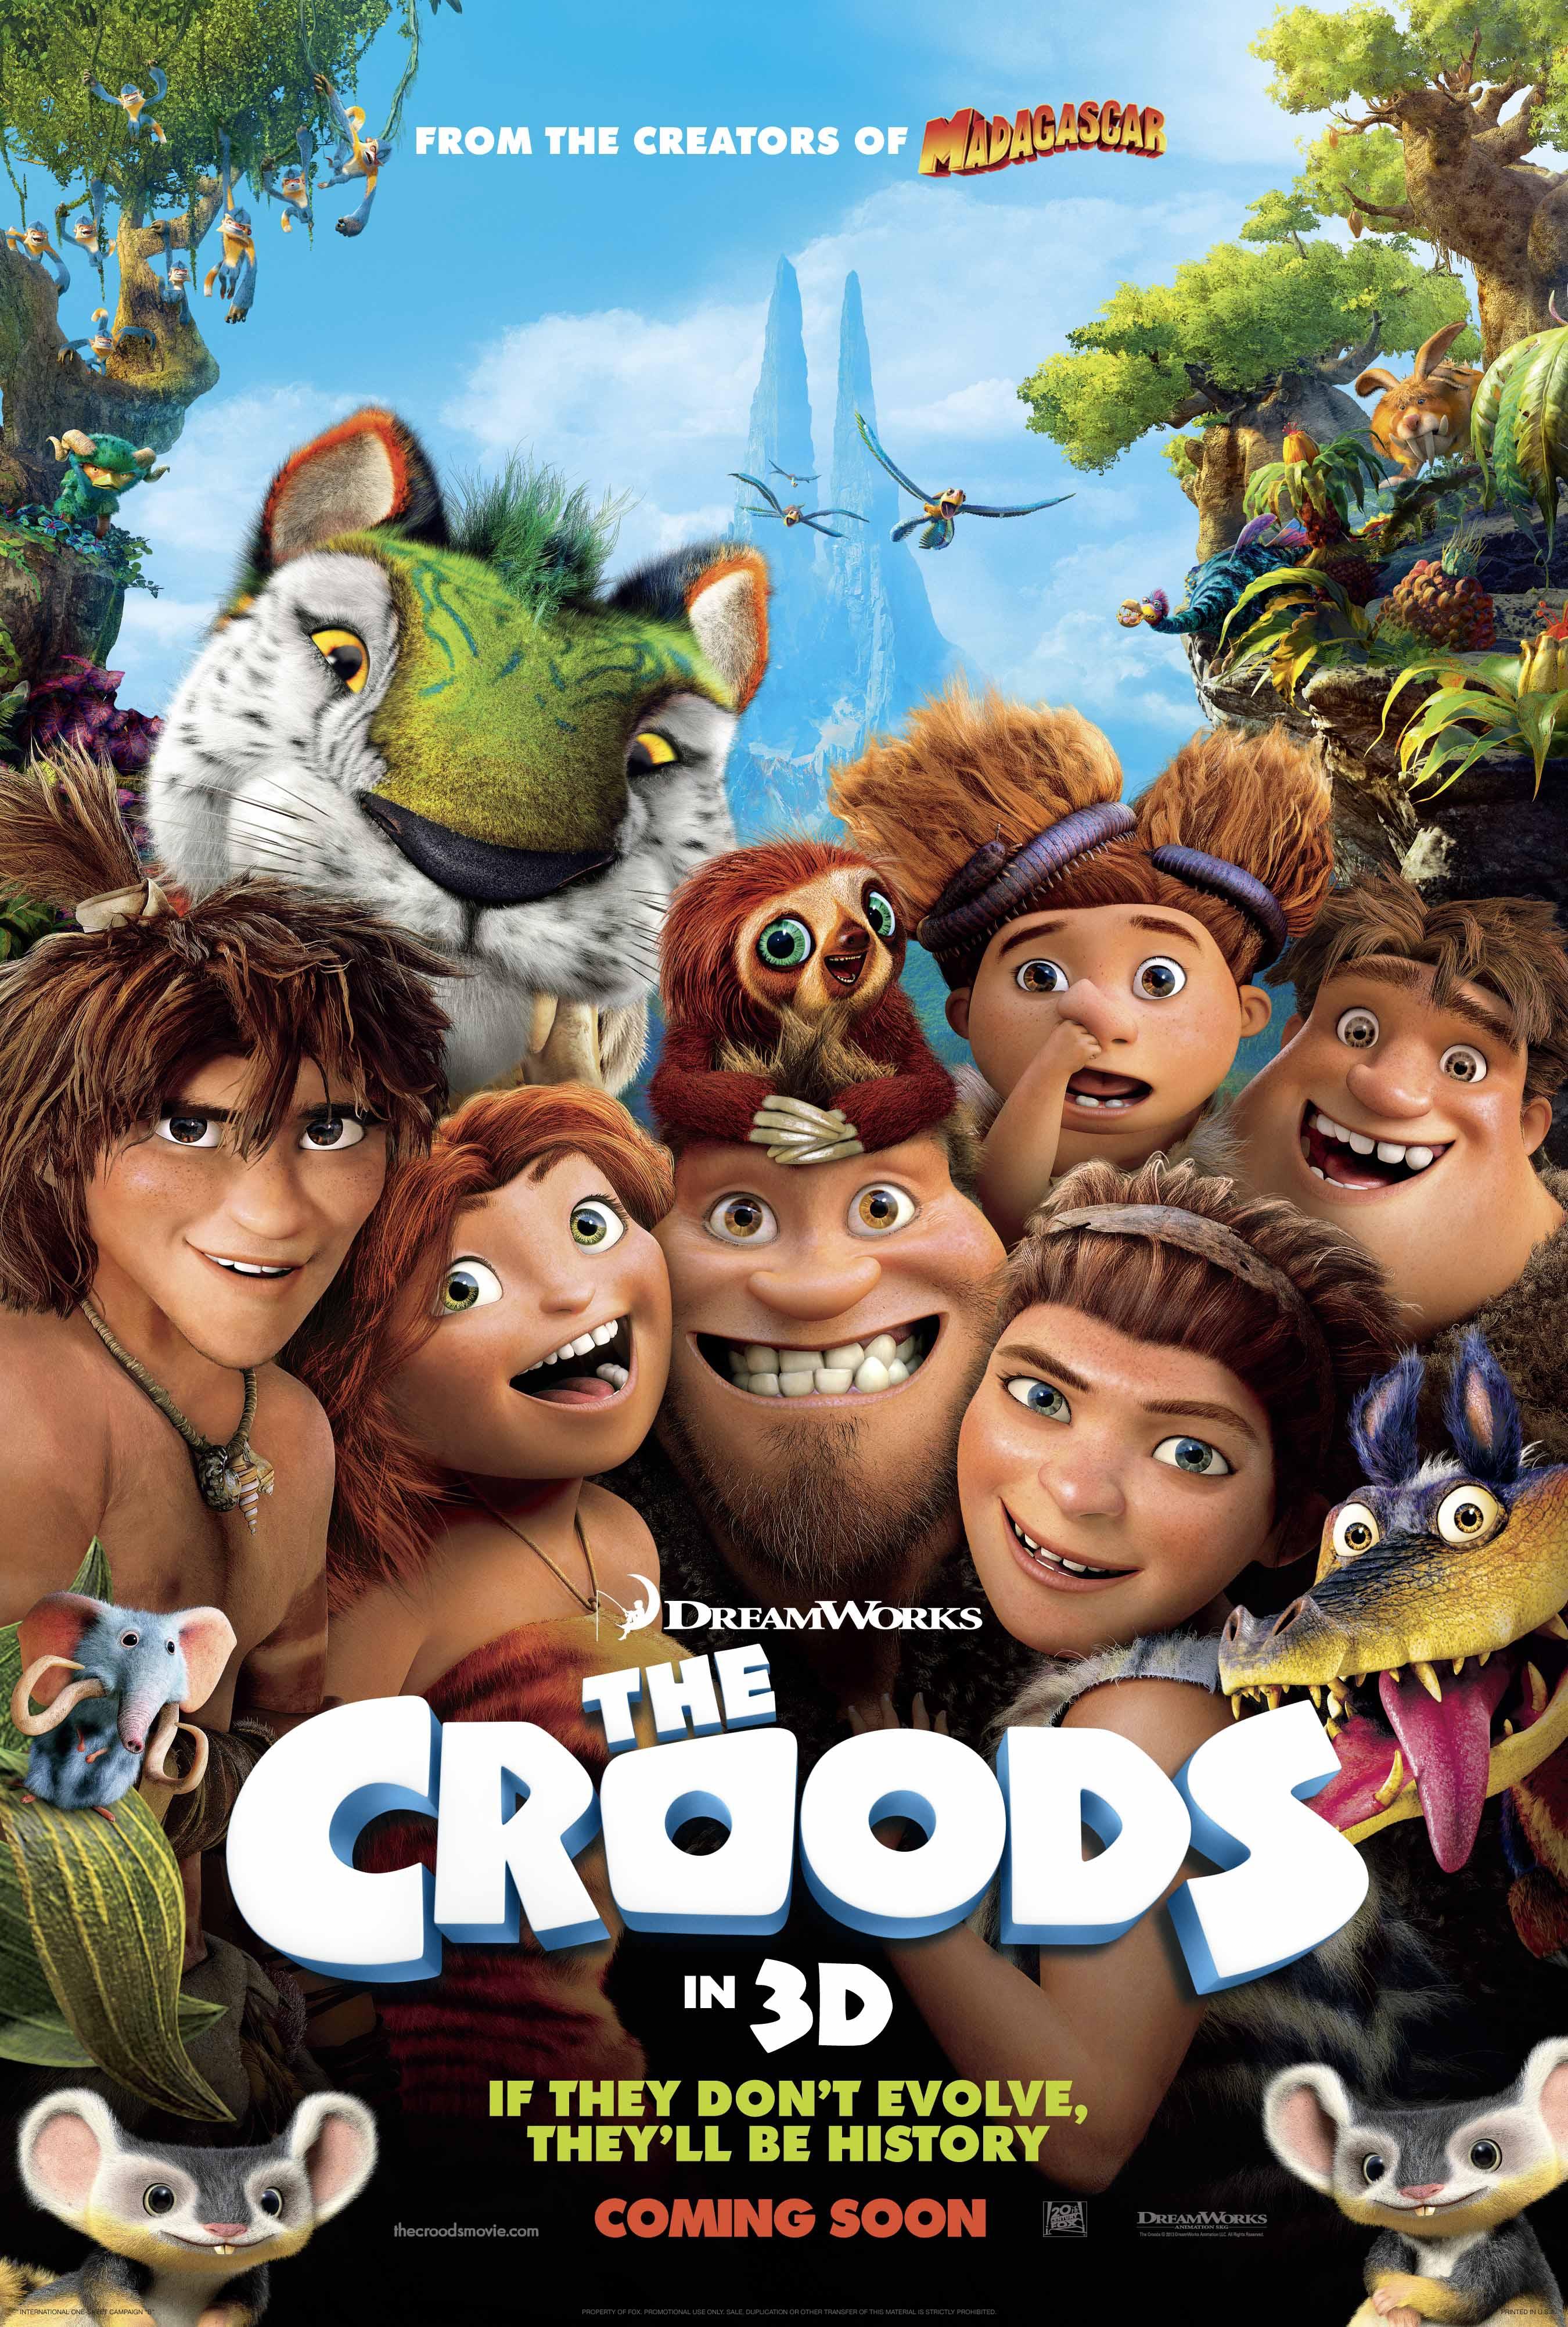 The Croods - Movie Poster #3 (Original)